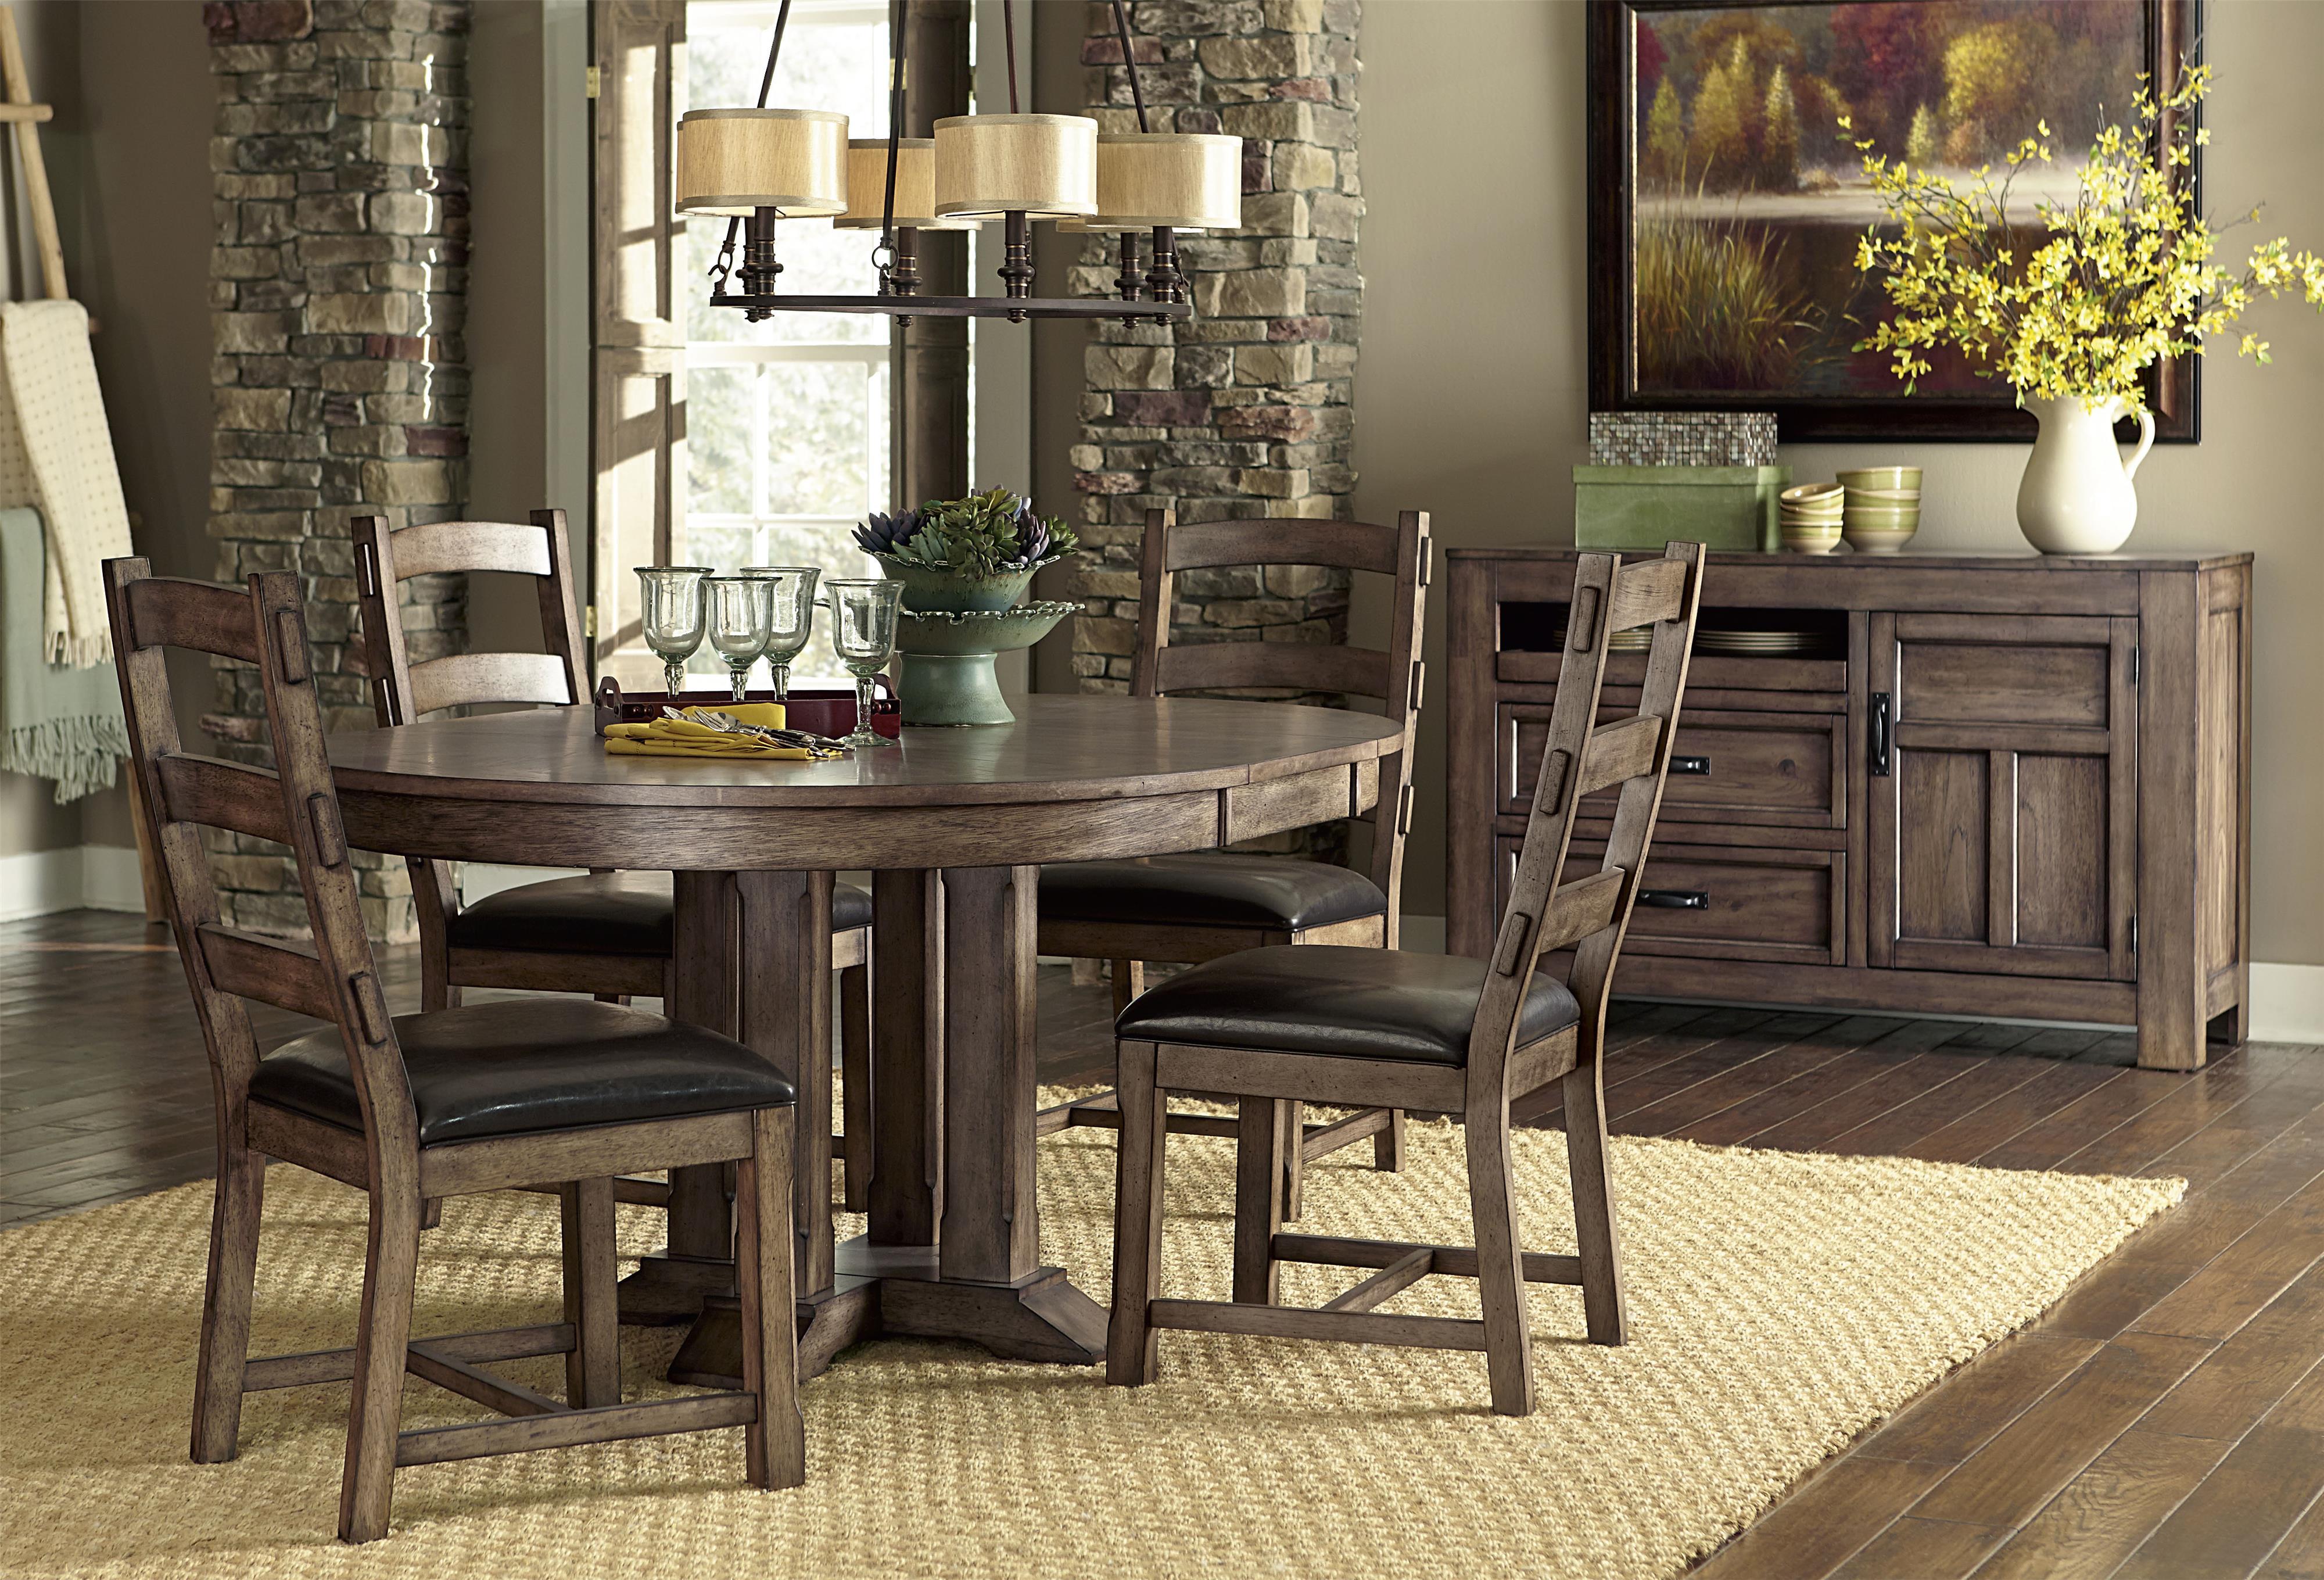 Progressive Furniture Boulder Creek Casual Dining Room Group - Item Number: P849 Dining Room Group 1